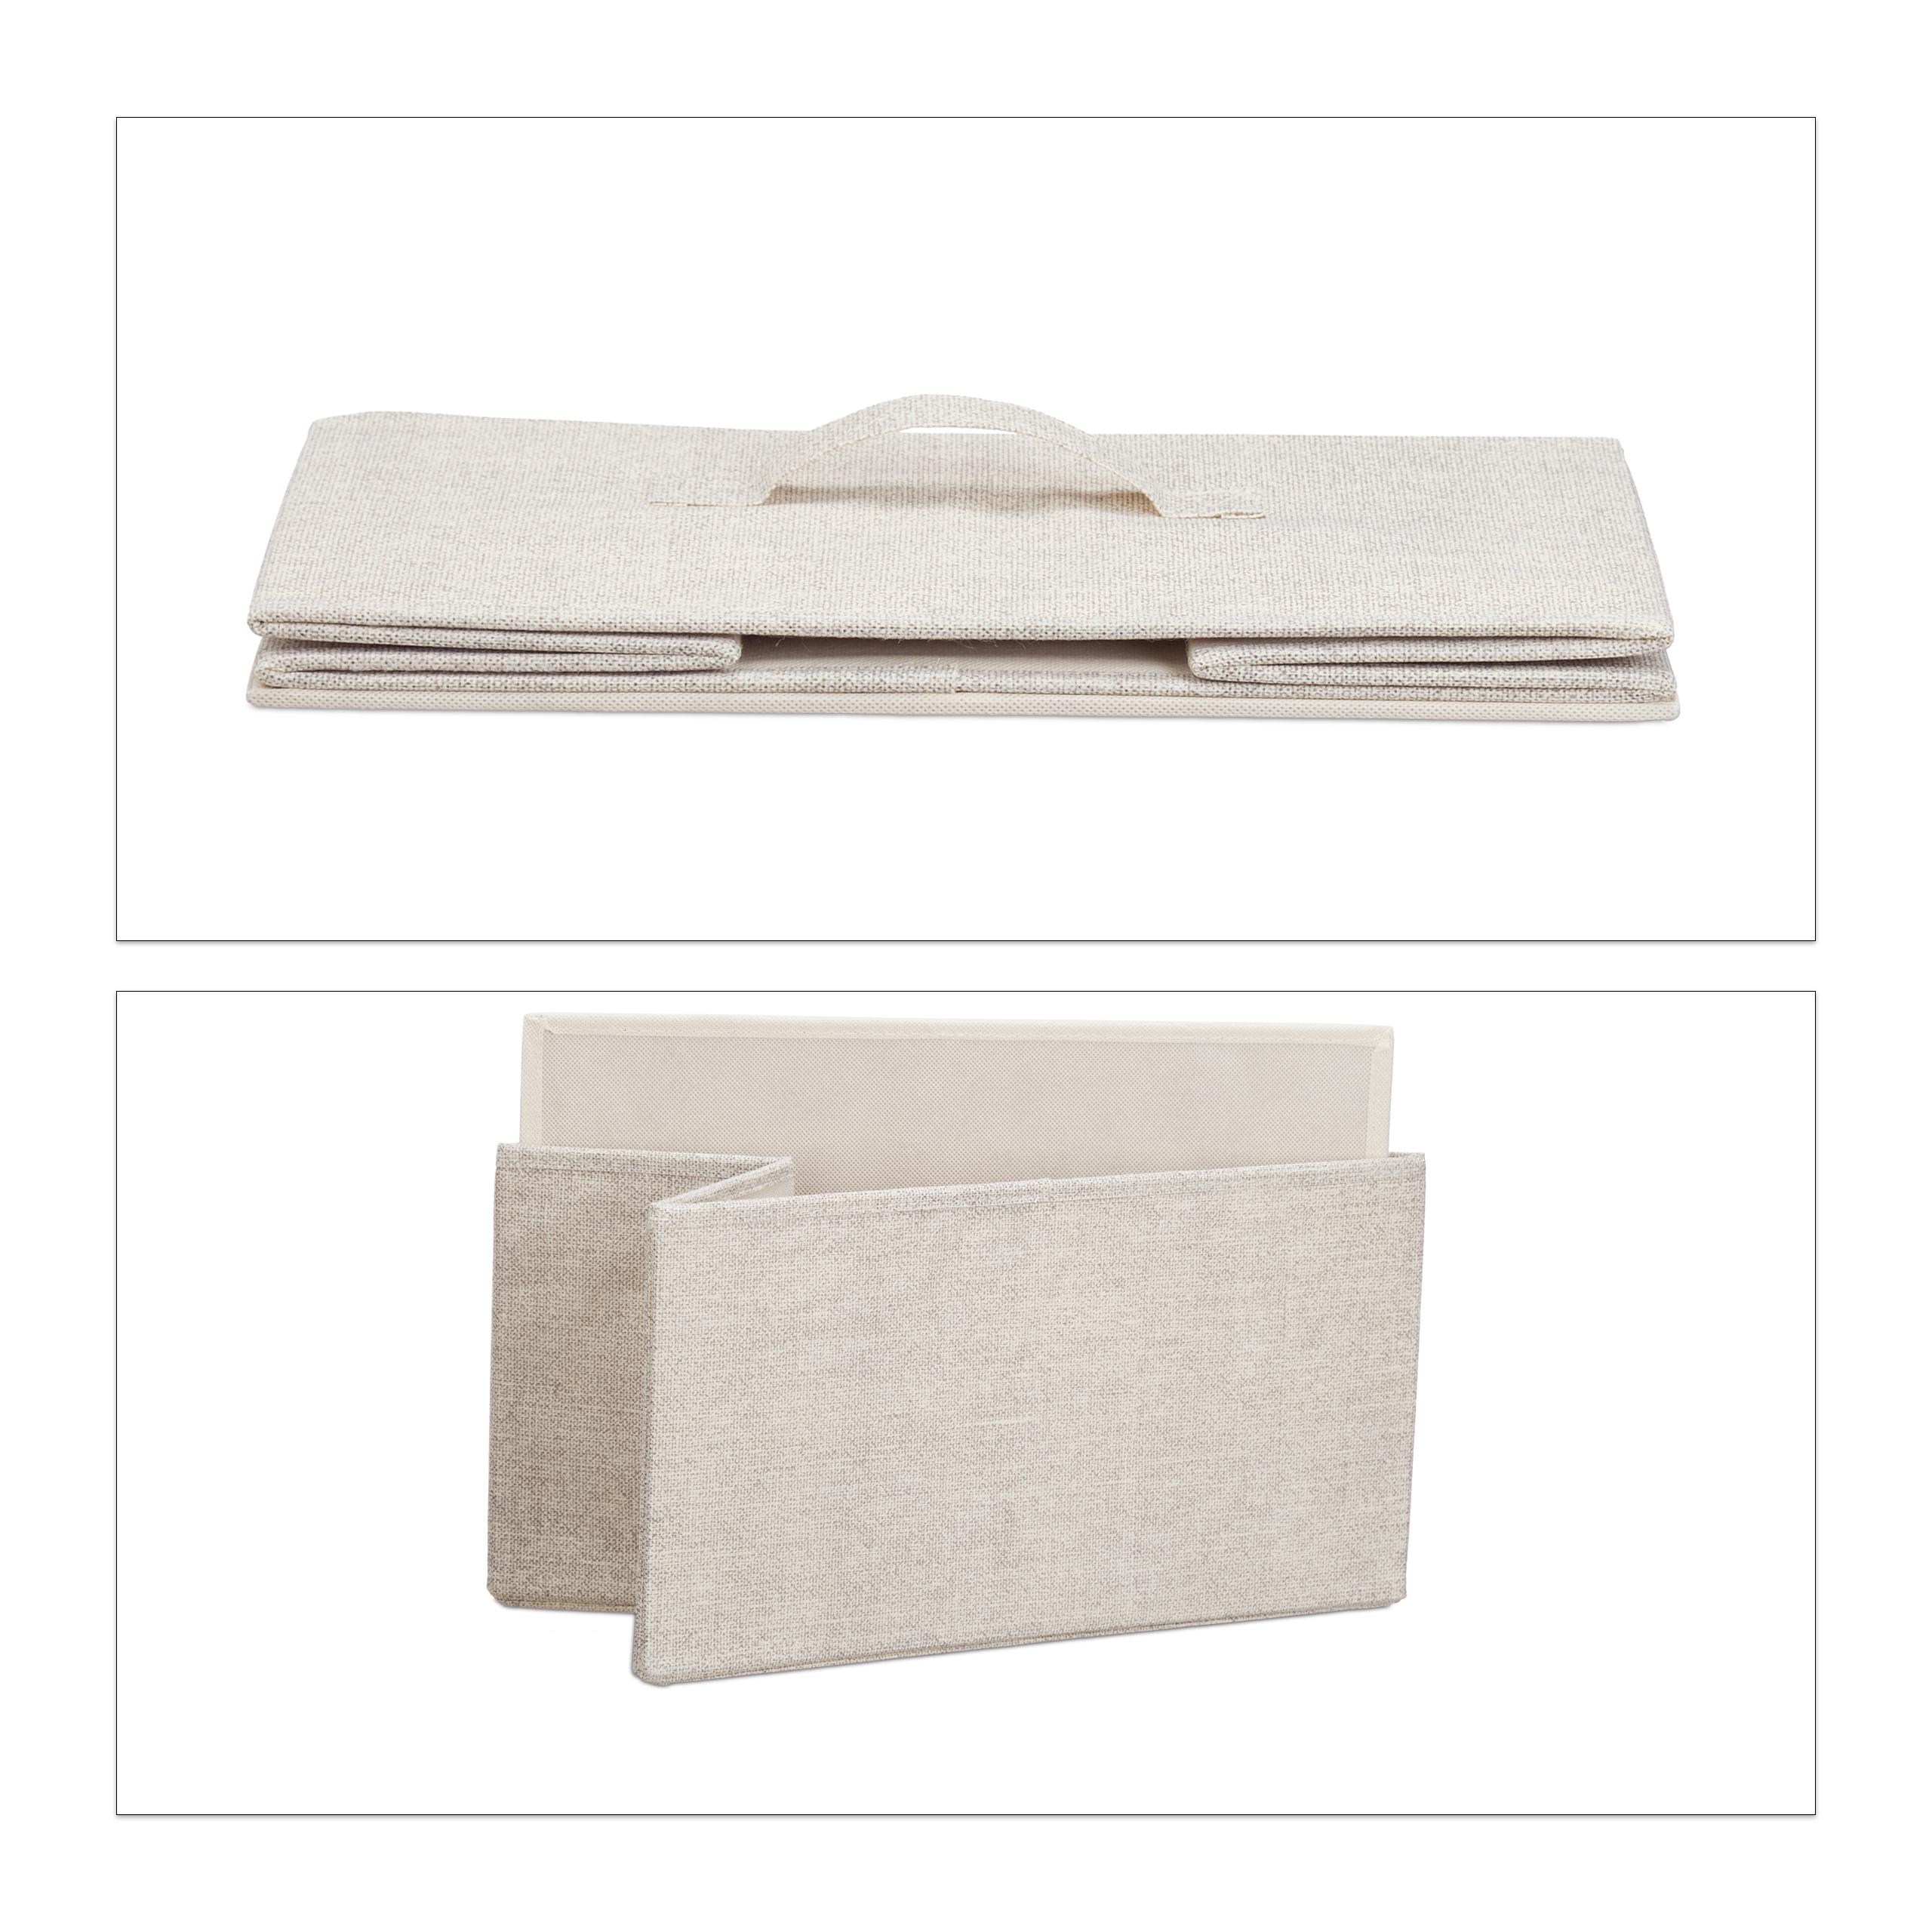 Kommode Beige Regalsystem Metall Schubladen Schubladenbox